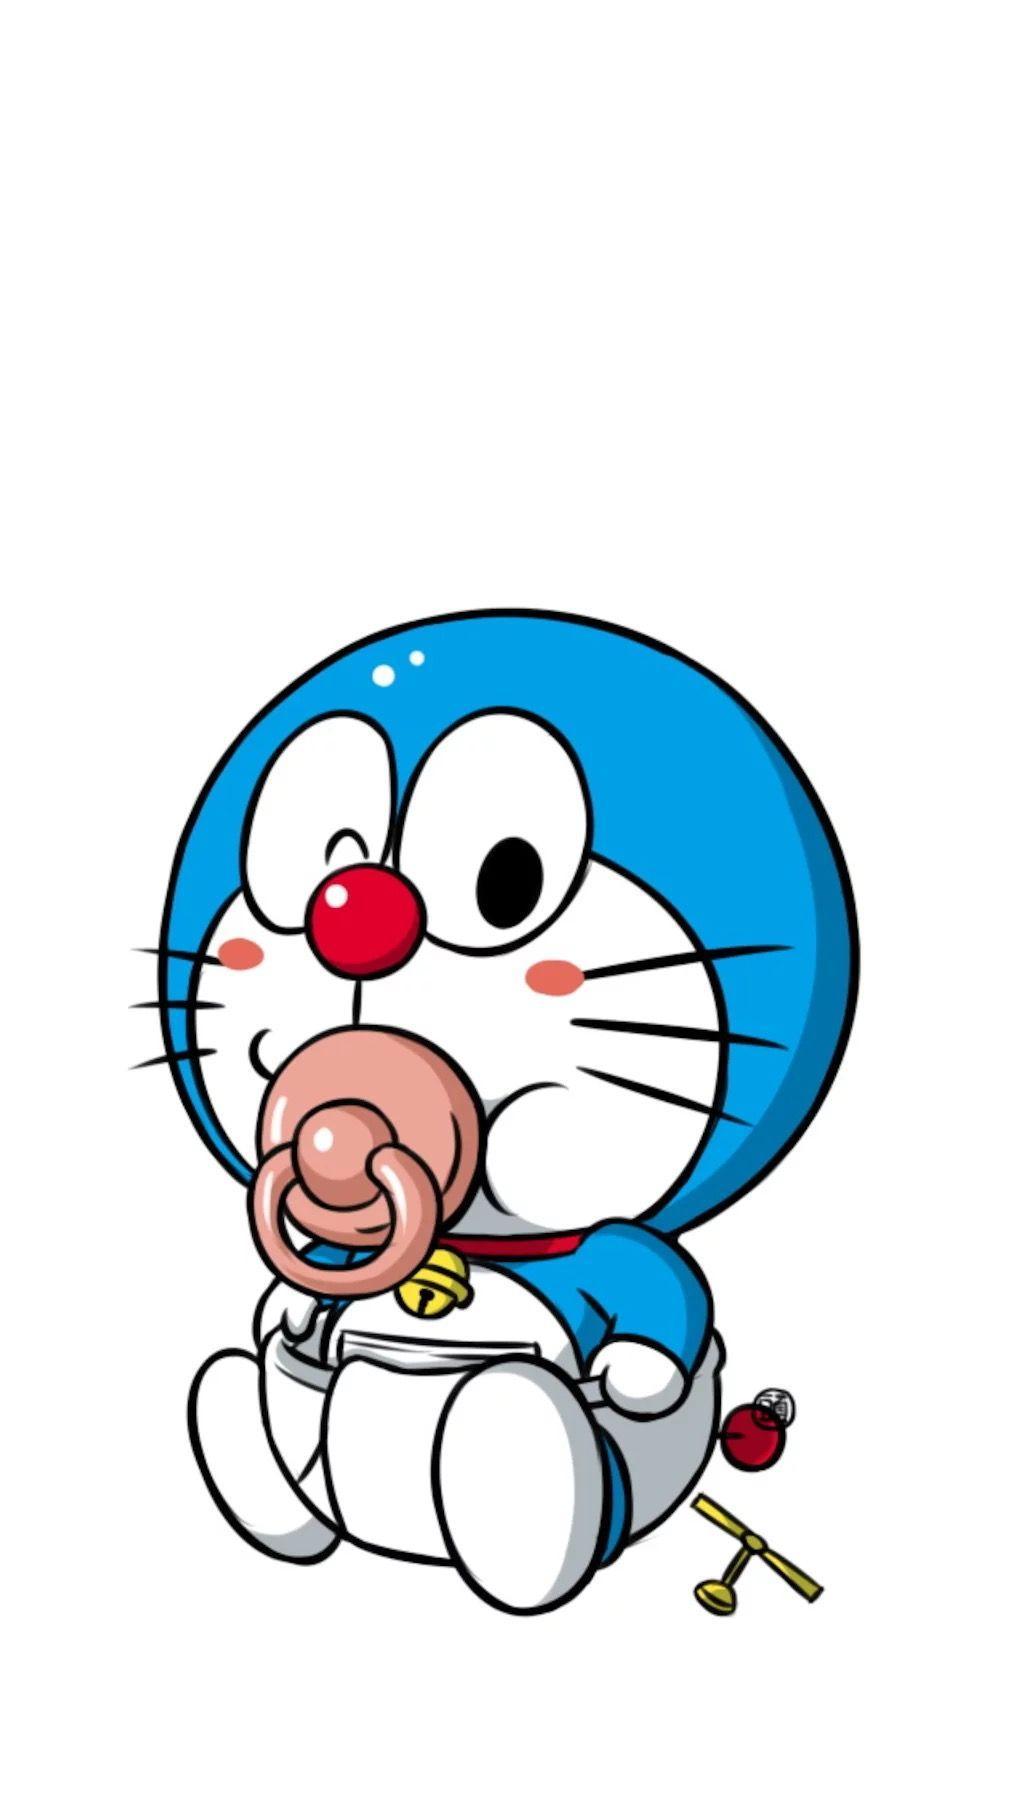 Doraemon Wallpapers Top Free Doraemon Backgrounds